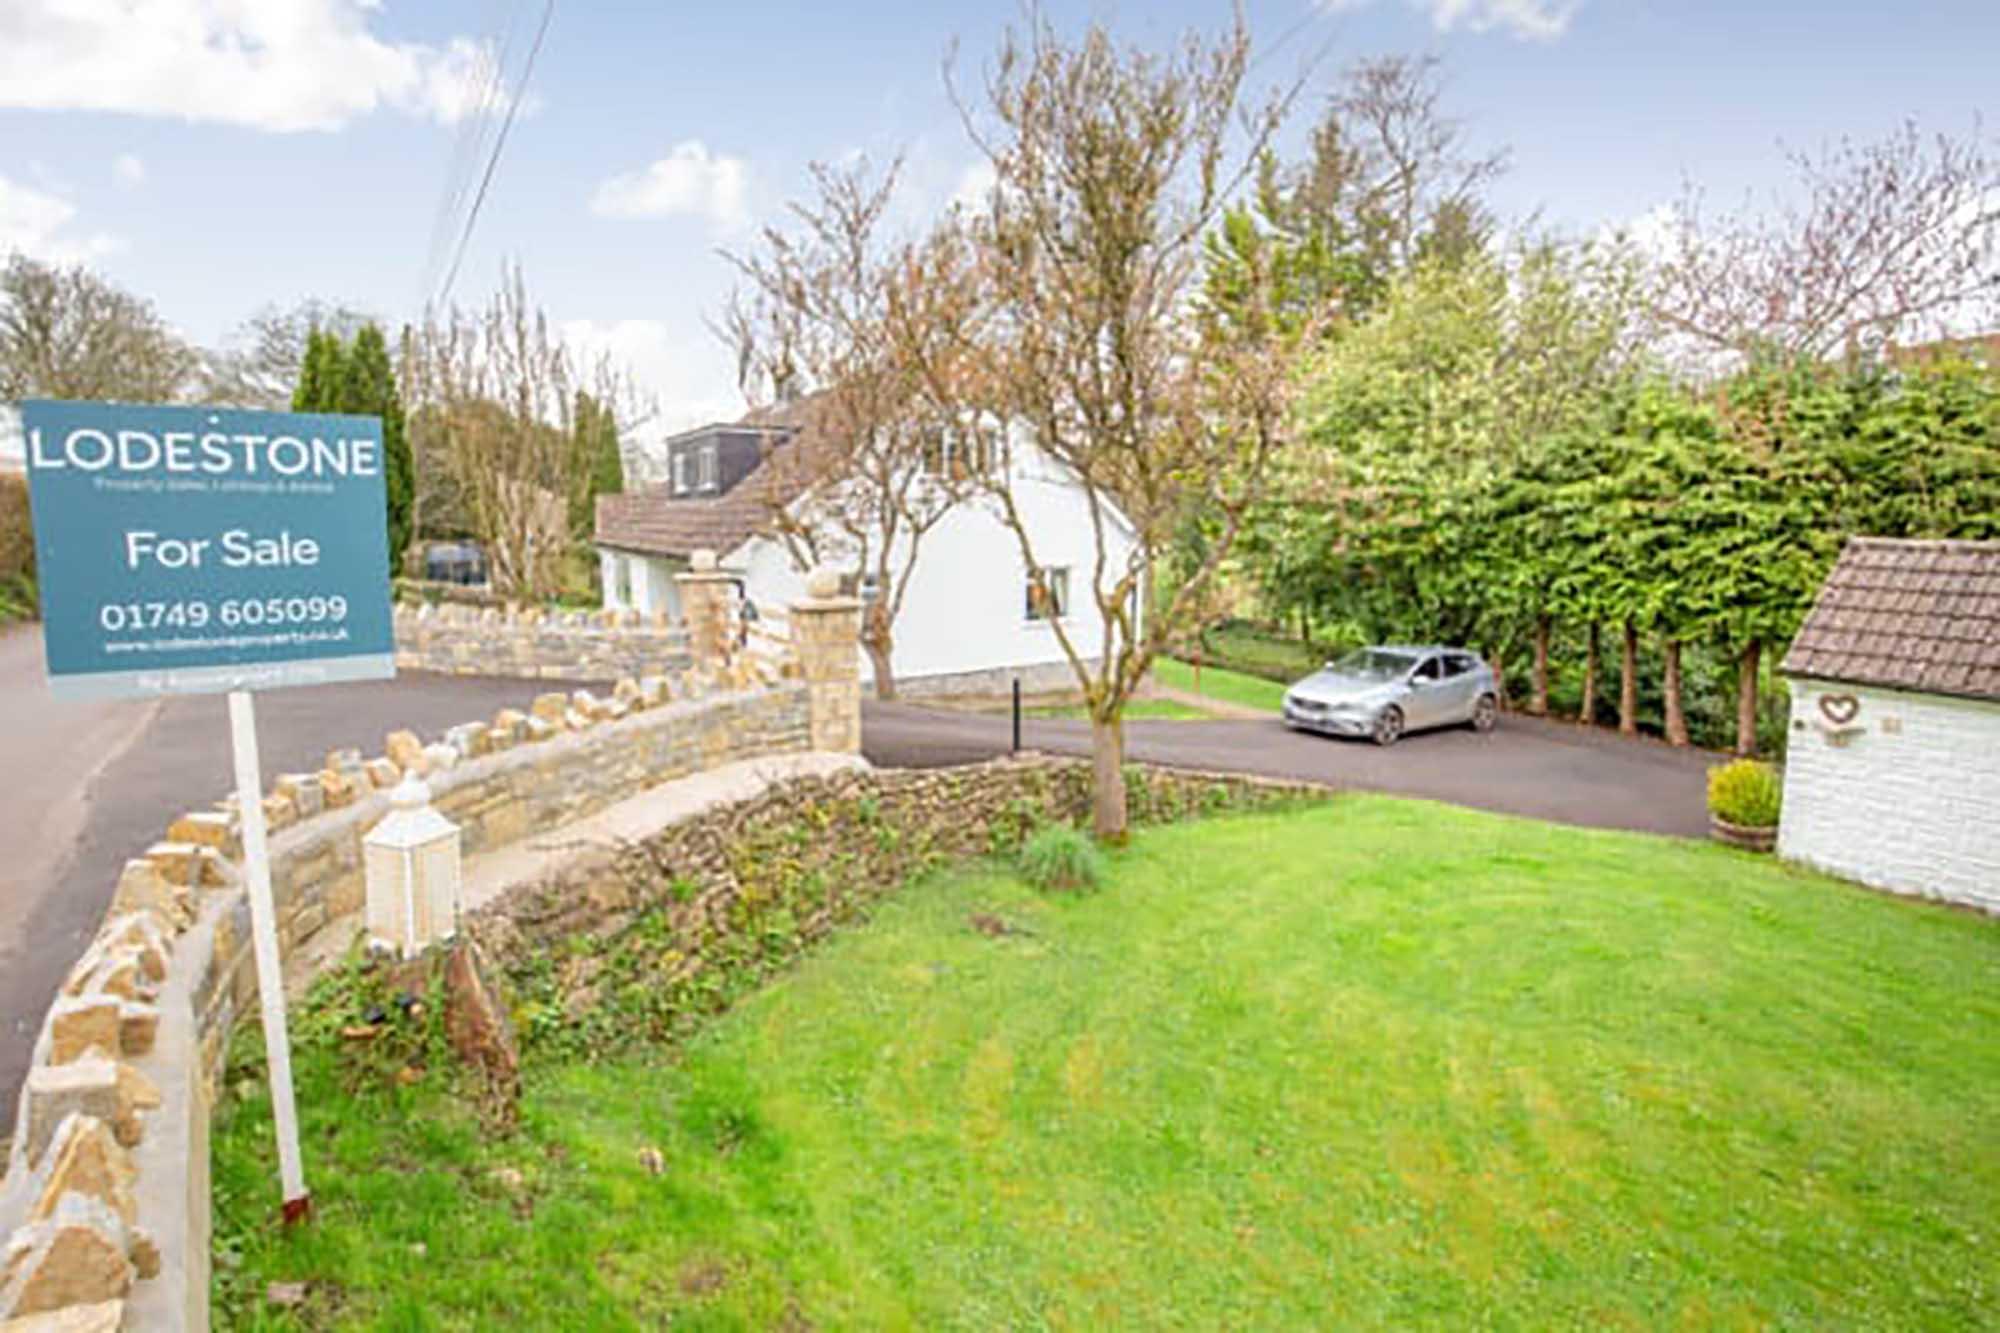 PILTON-Spacious detached house in idyllic location